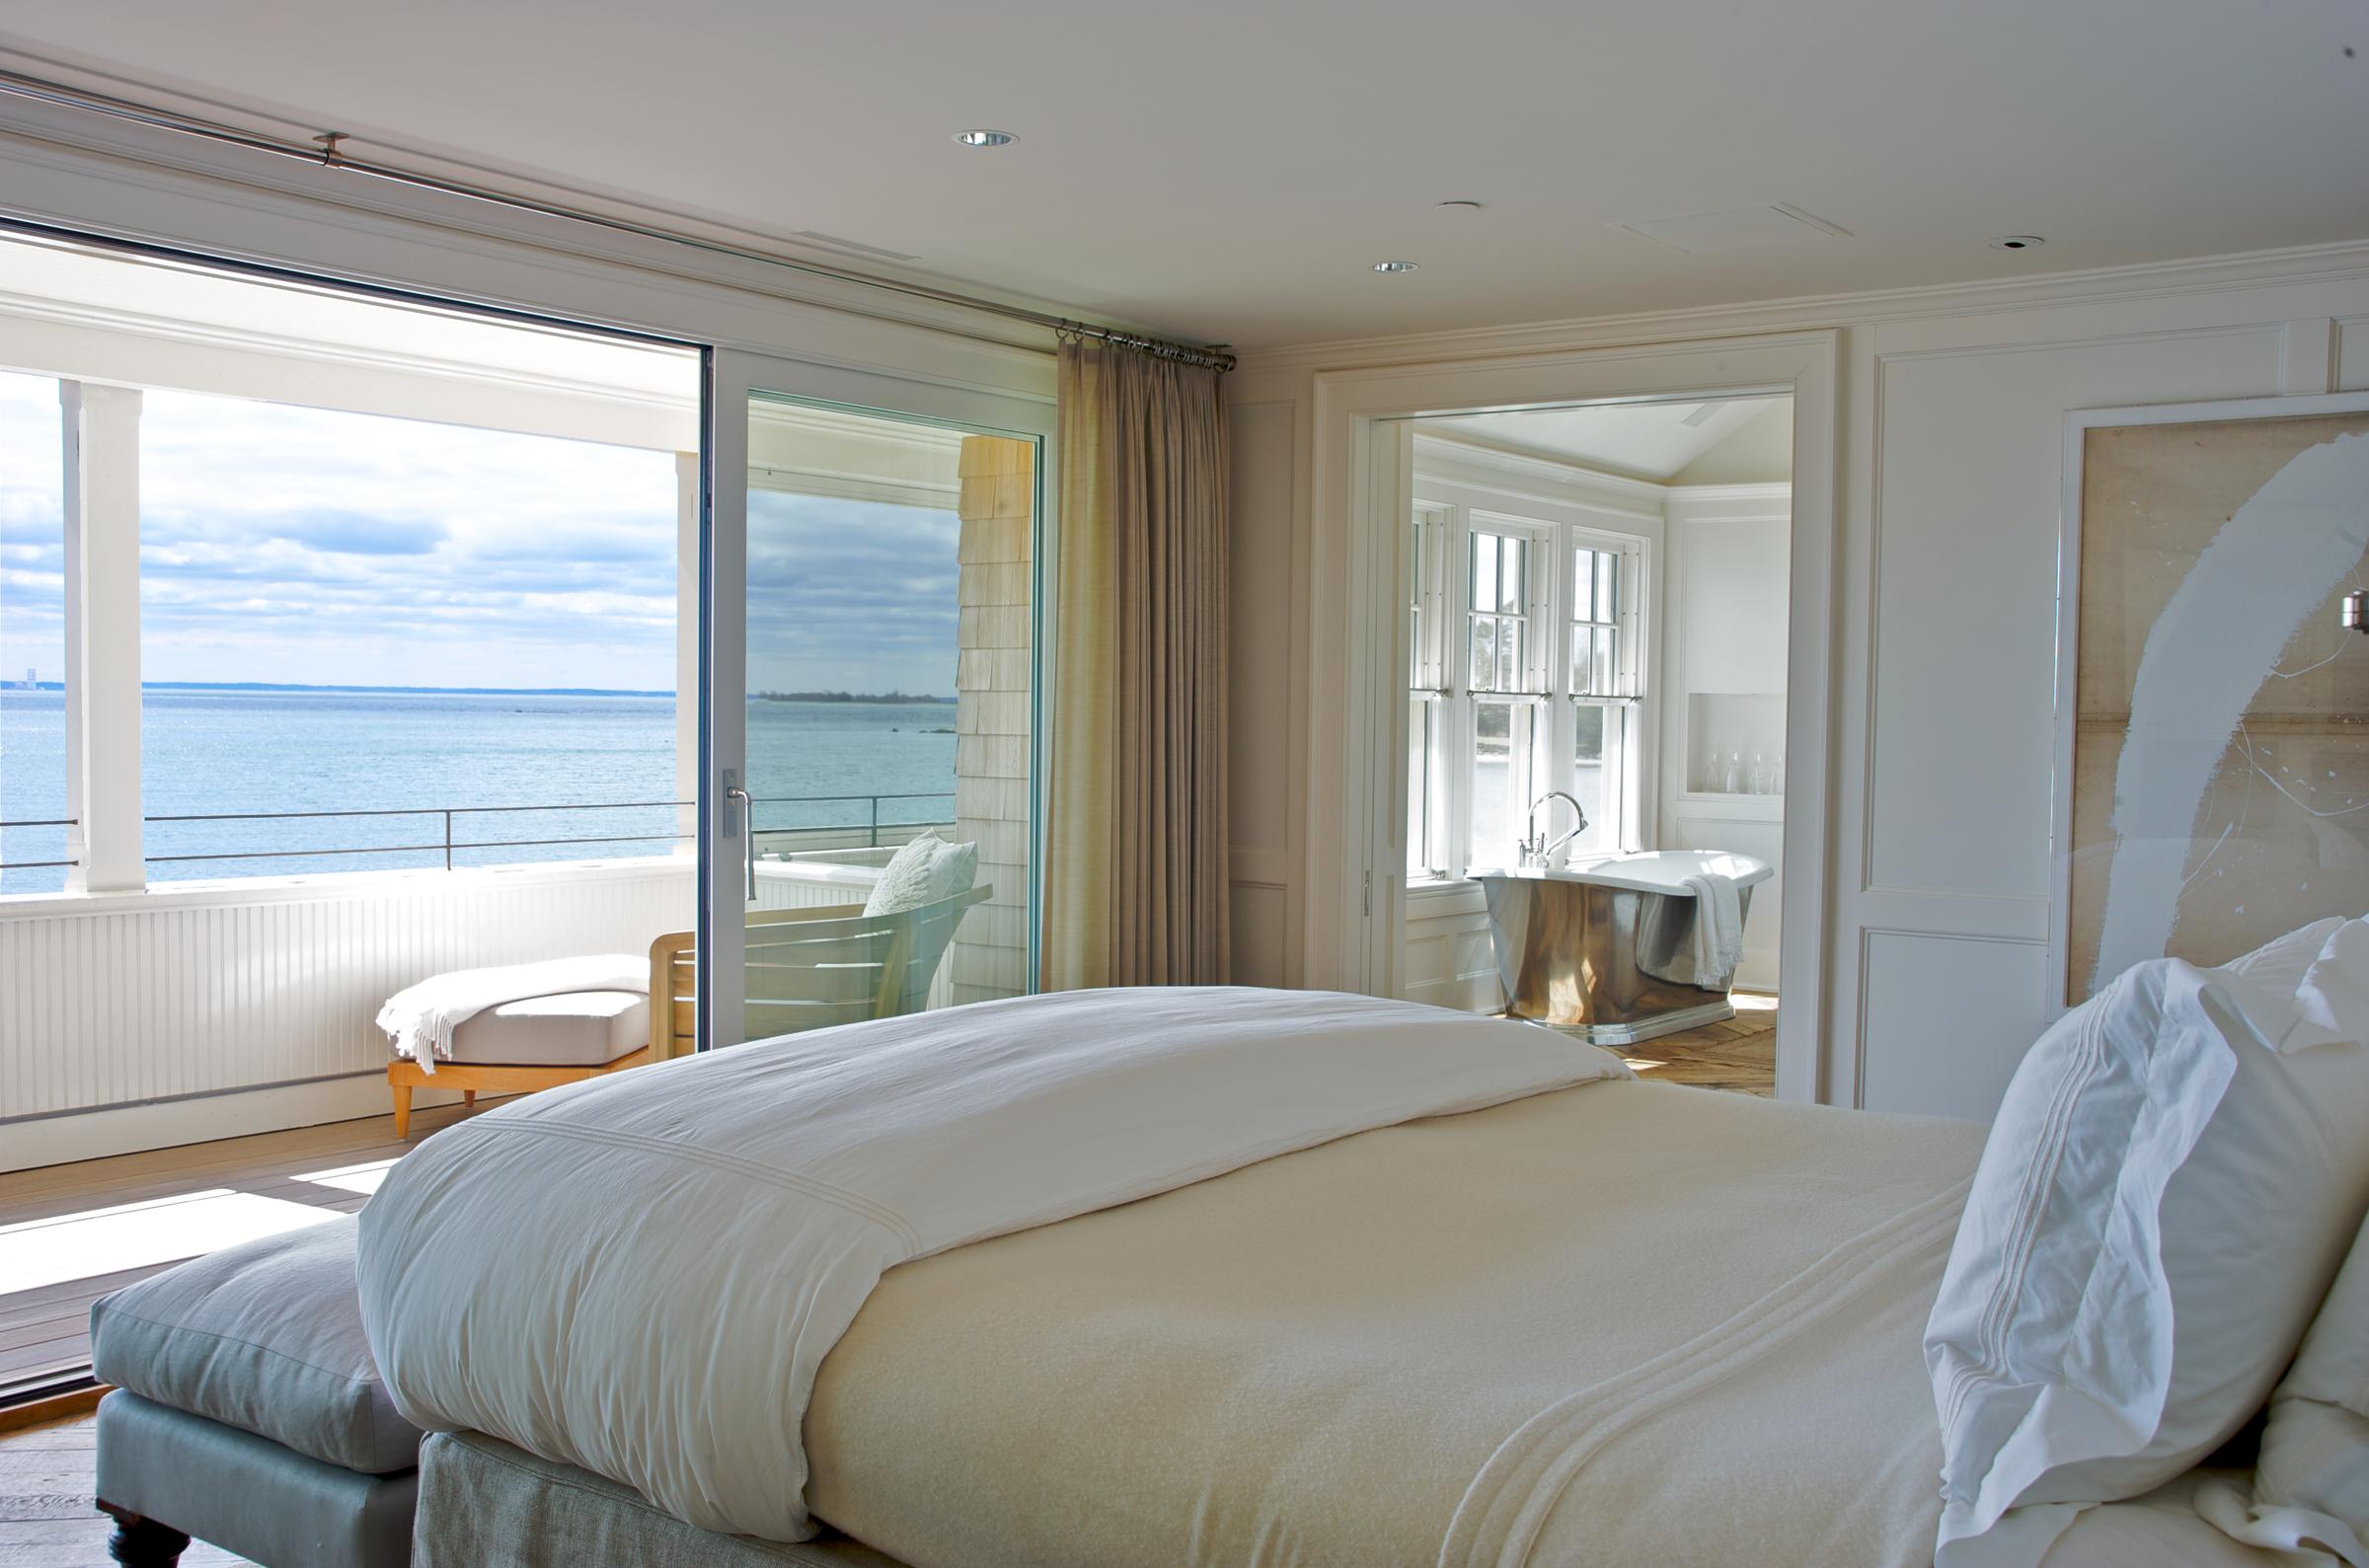 master bedroom with window view.jpg